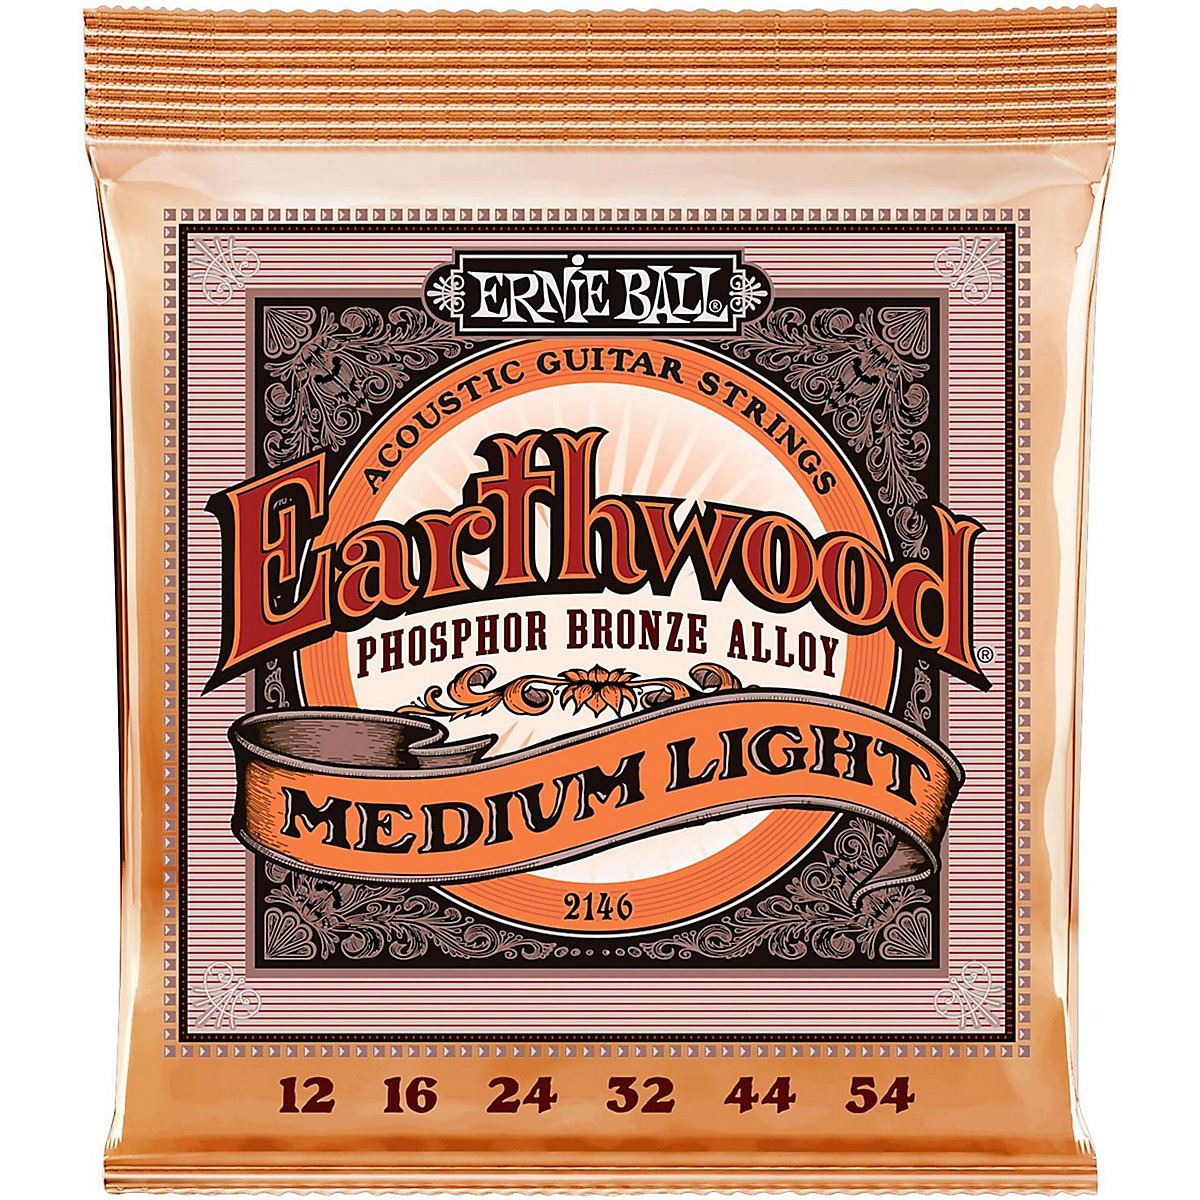 Ernie Ball 2146 Earthwood Phosphor Bronze Medium-Light Acoustic Guitar Strings